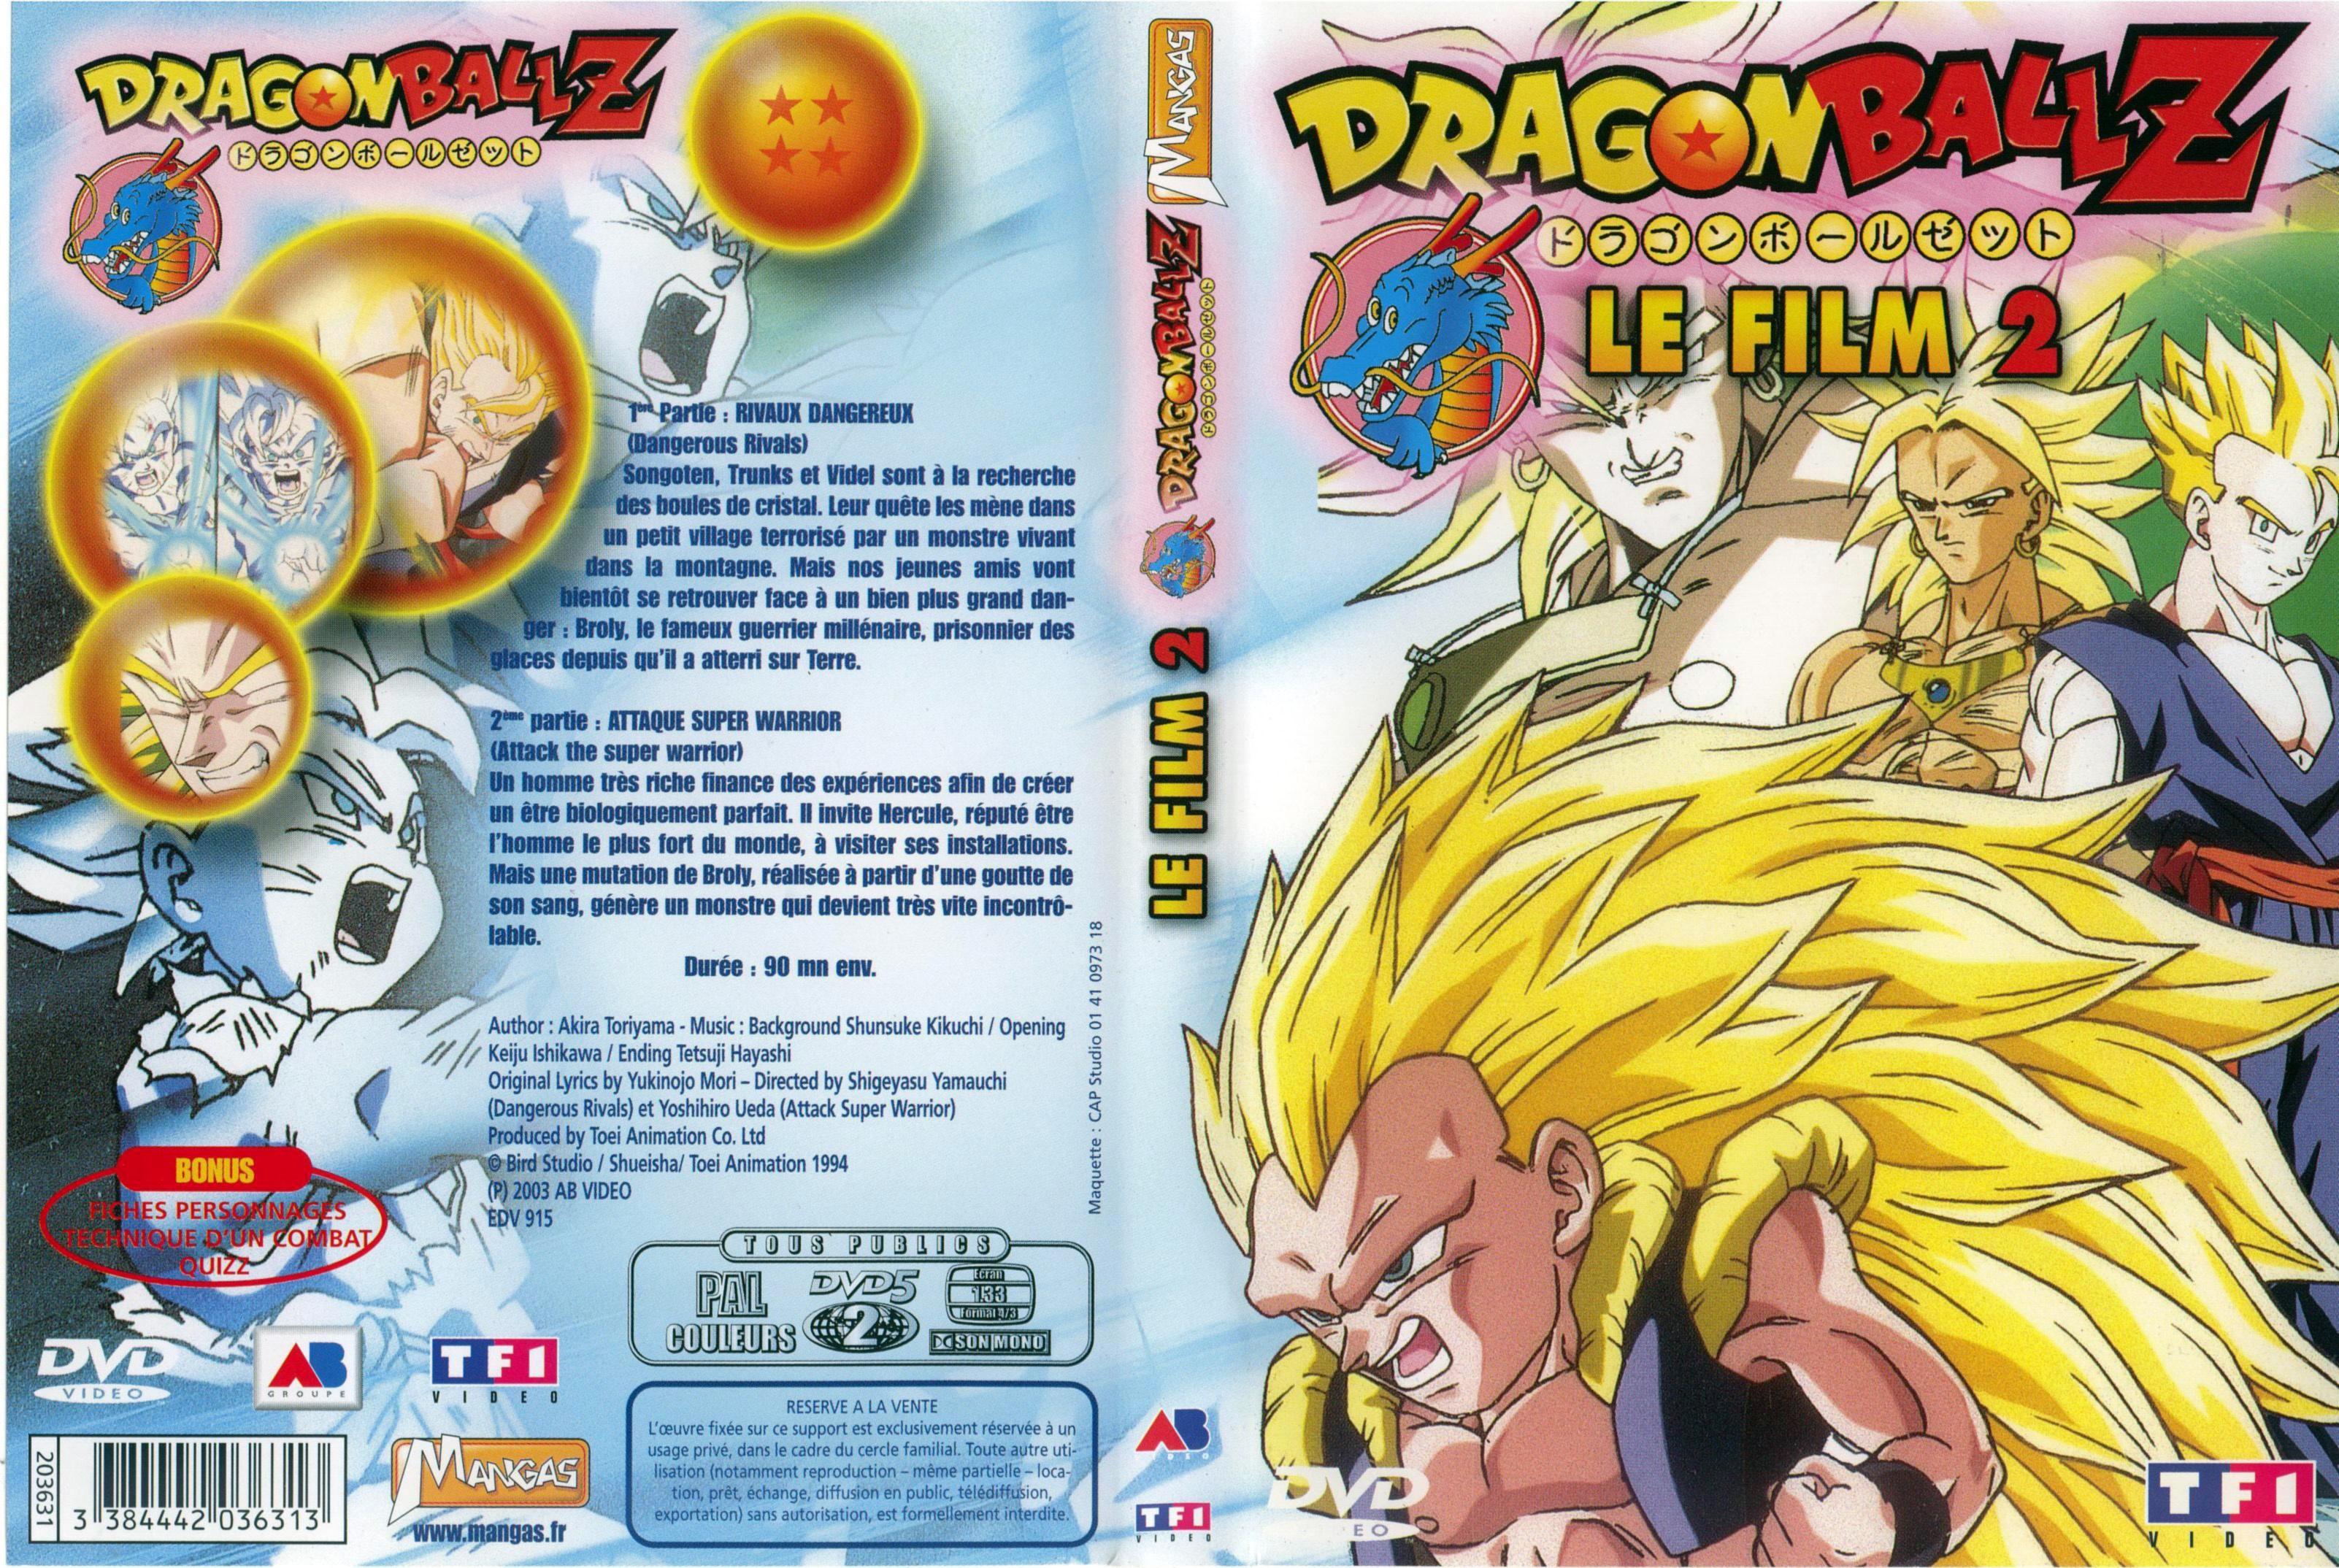 Dvd dragon ball z le film vol 2 anime dvd manga news - Dragon ball z broly le super guerrier vf ...